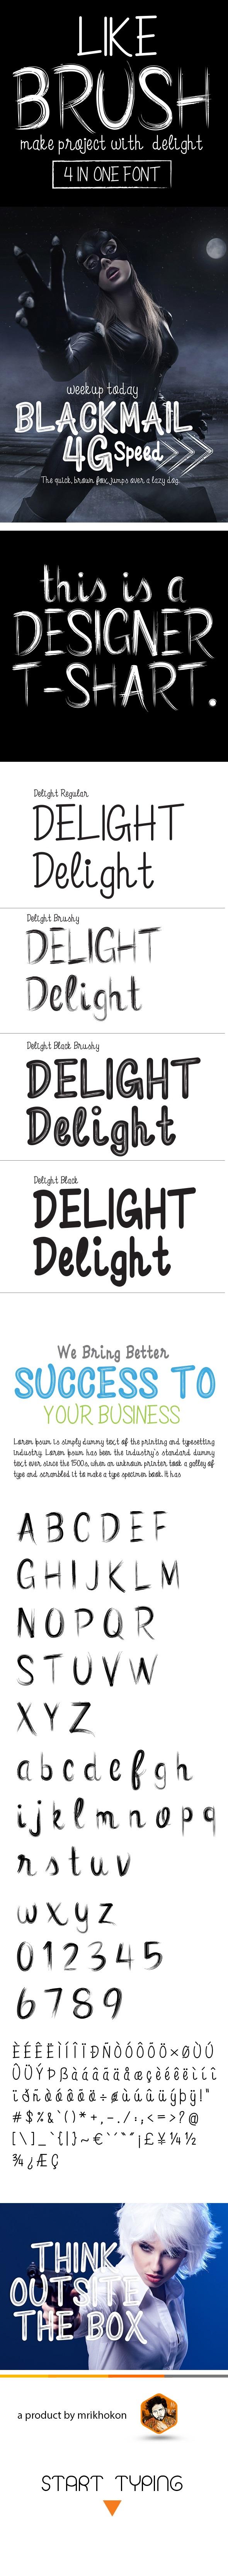 Delight Font - Sans-Serif Fonts